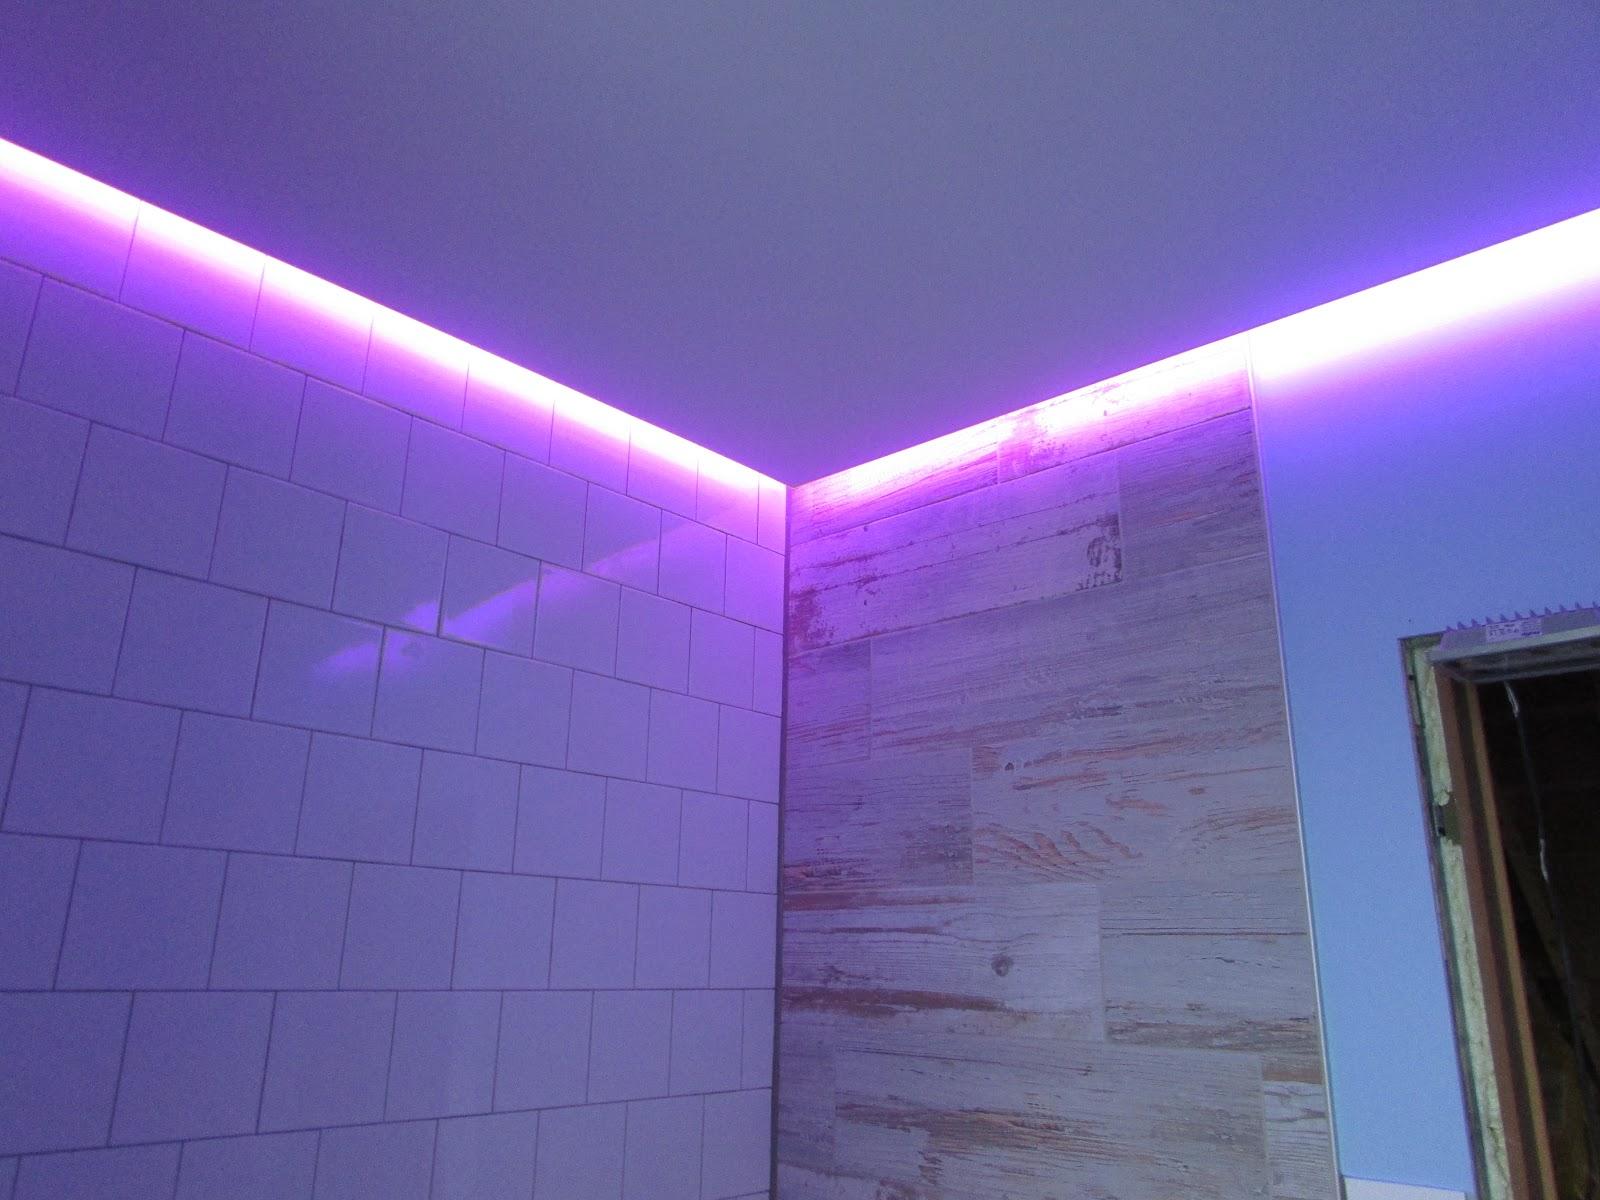 verbouwing van ons ouderlijk huis: silicone en elektriciteit badkamer